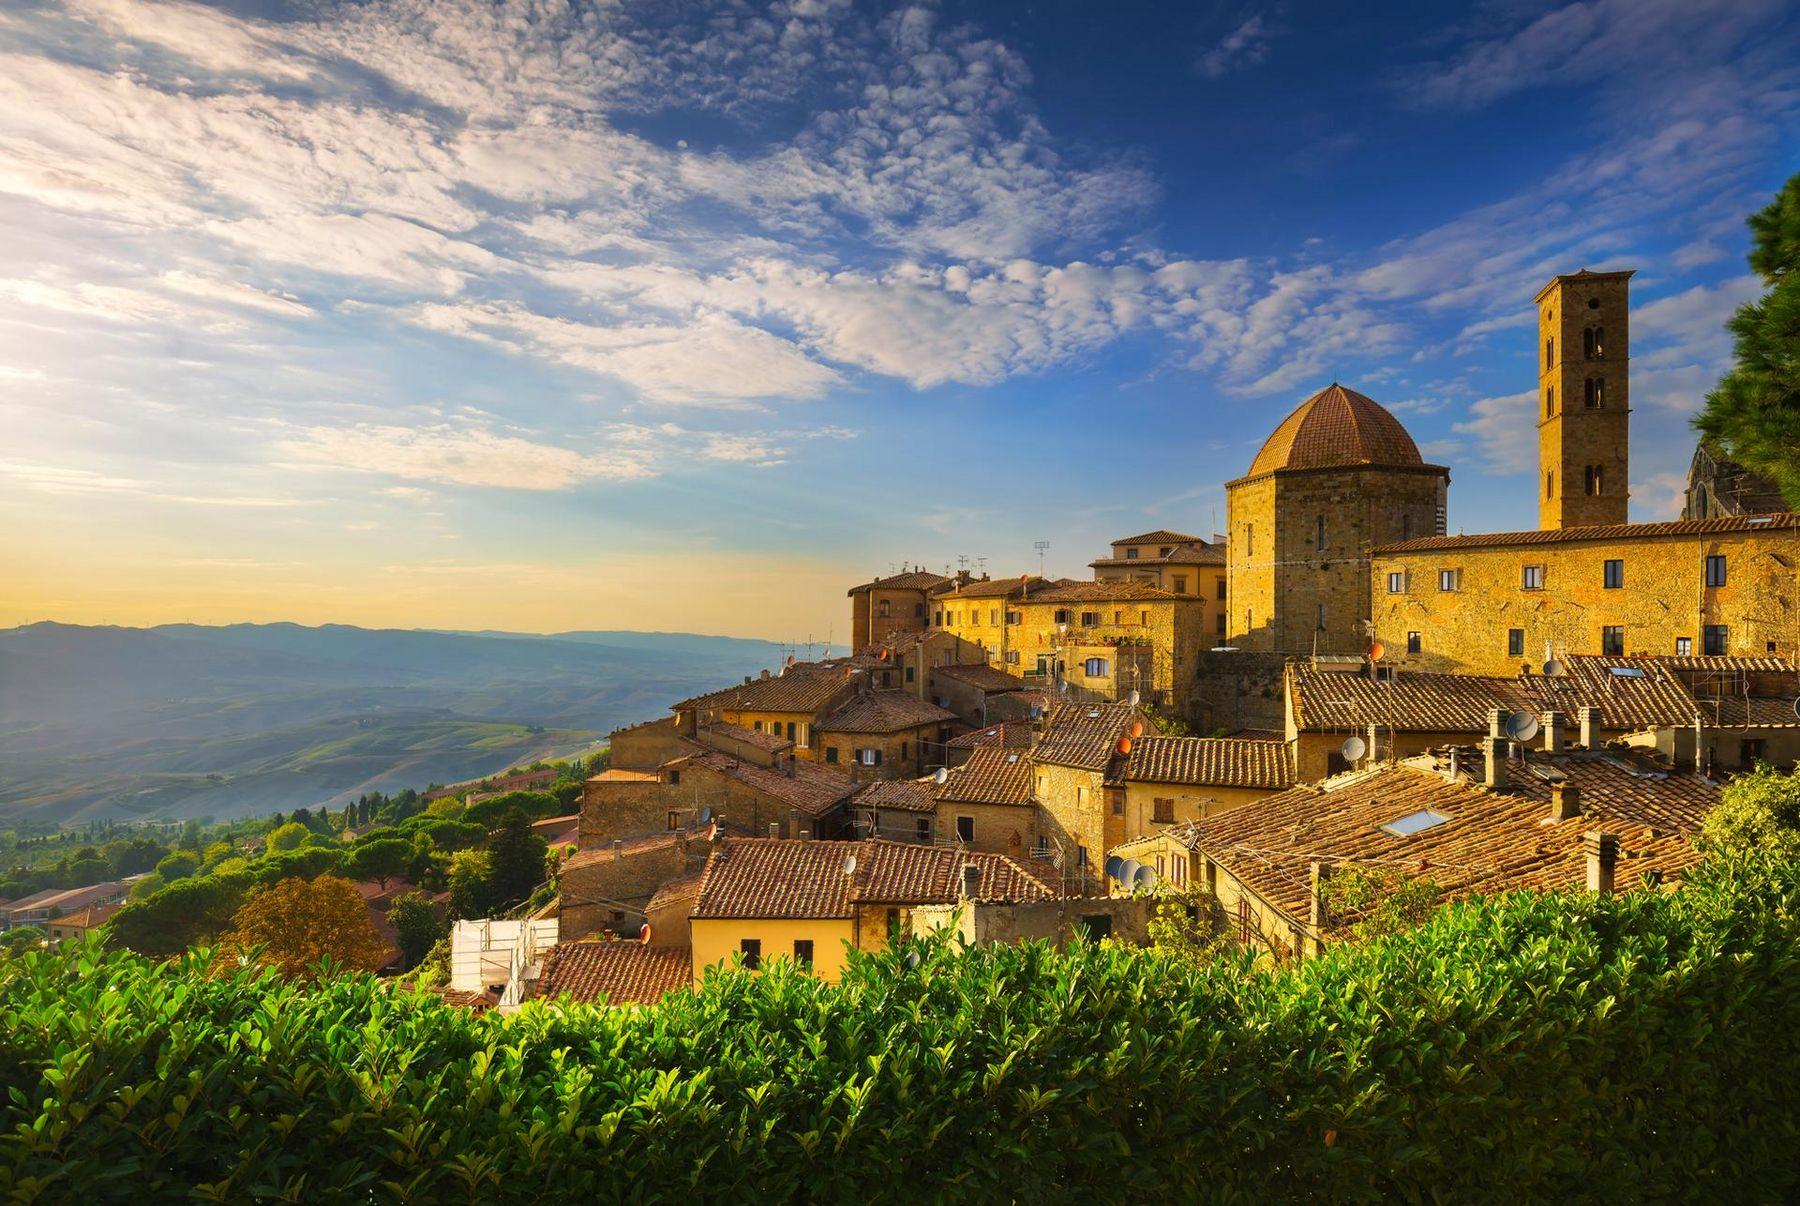 Volterra Italien Pisa Toskana Chianti Region iStock 610570662